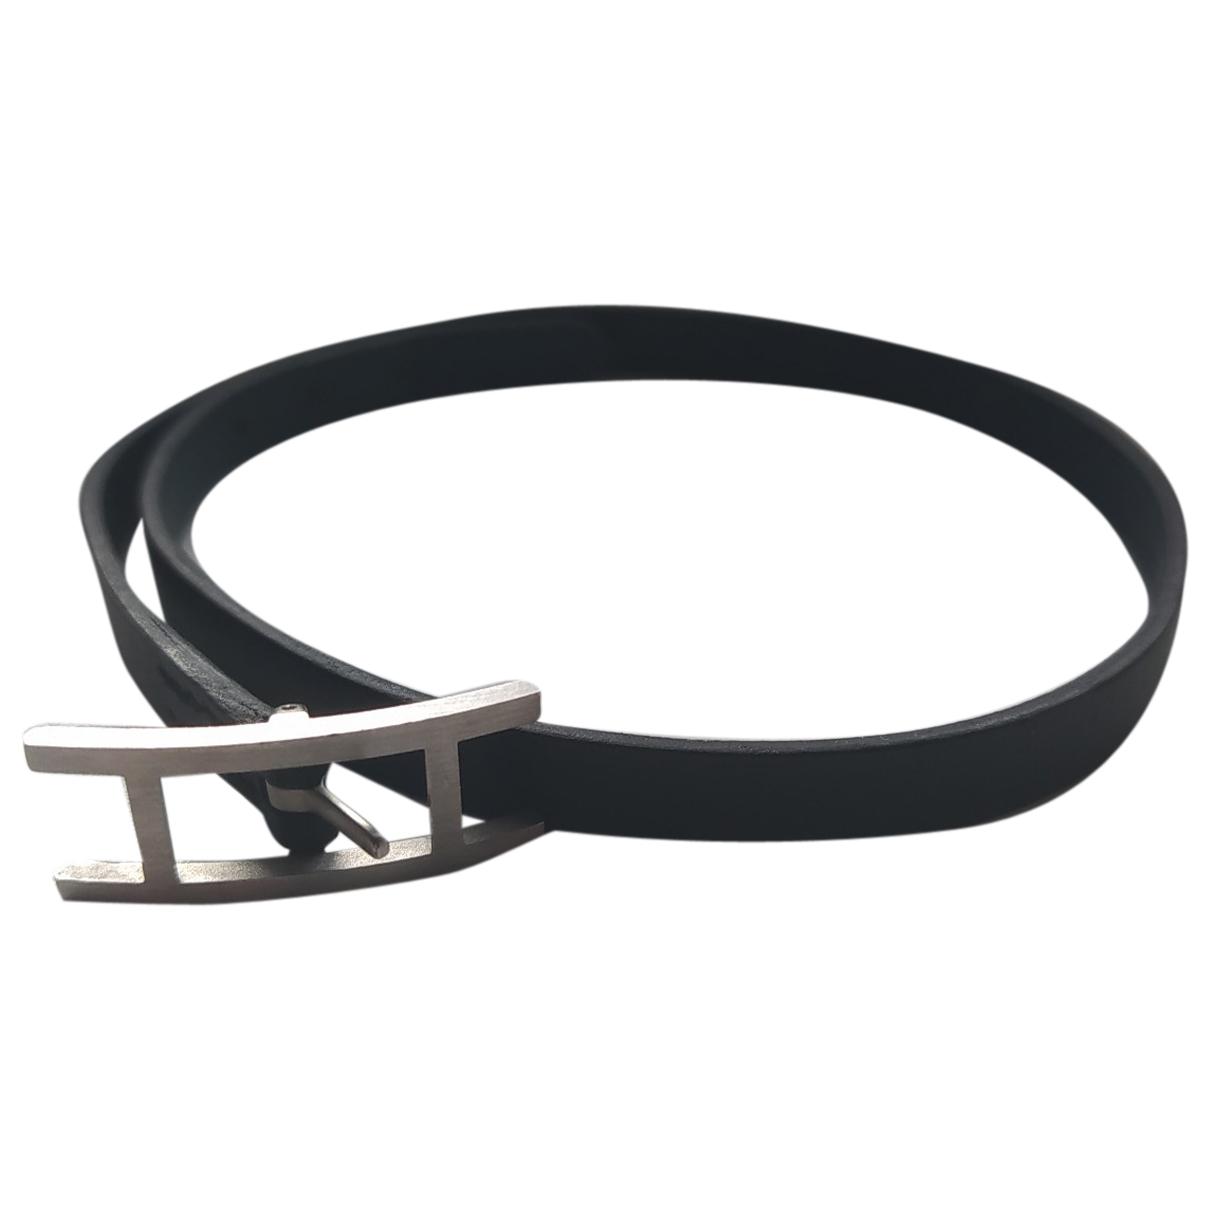 Hermes - Bracelet Behapi pour femme en cuir - marine